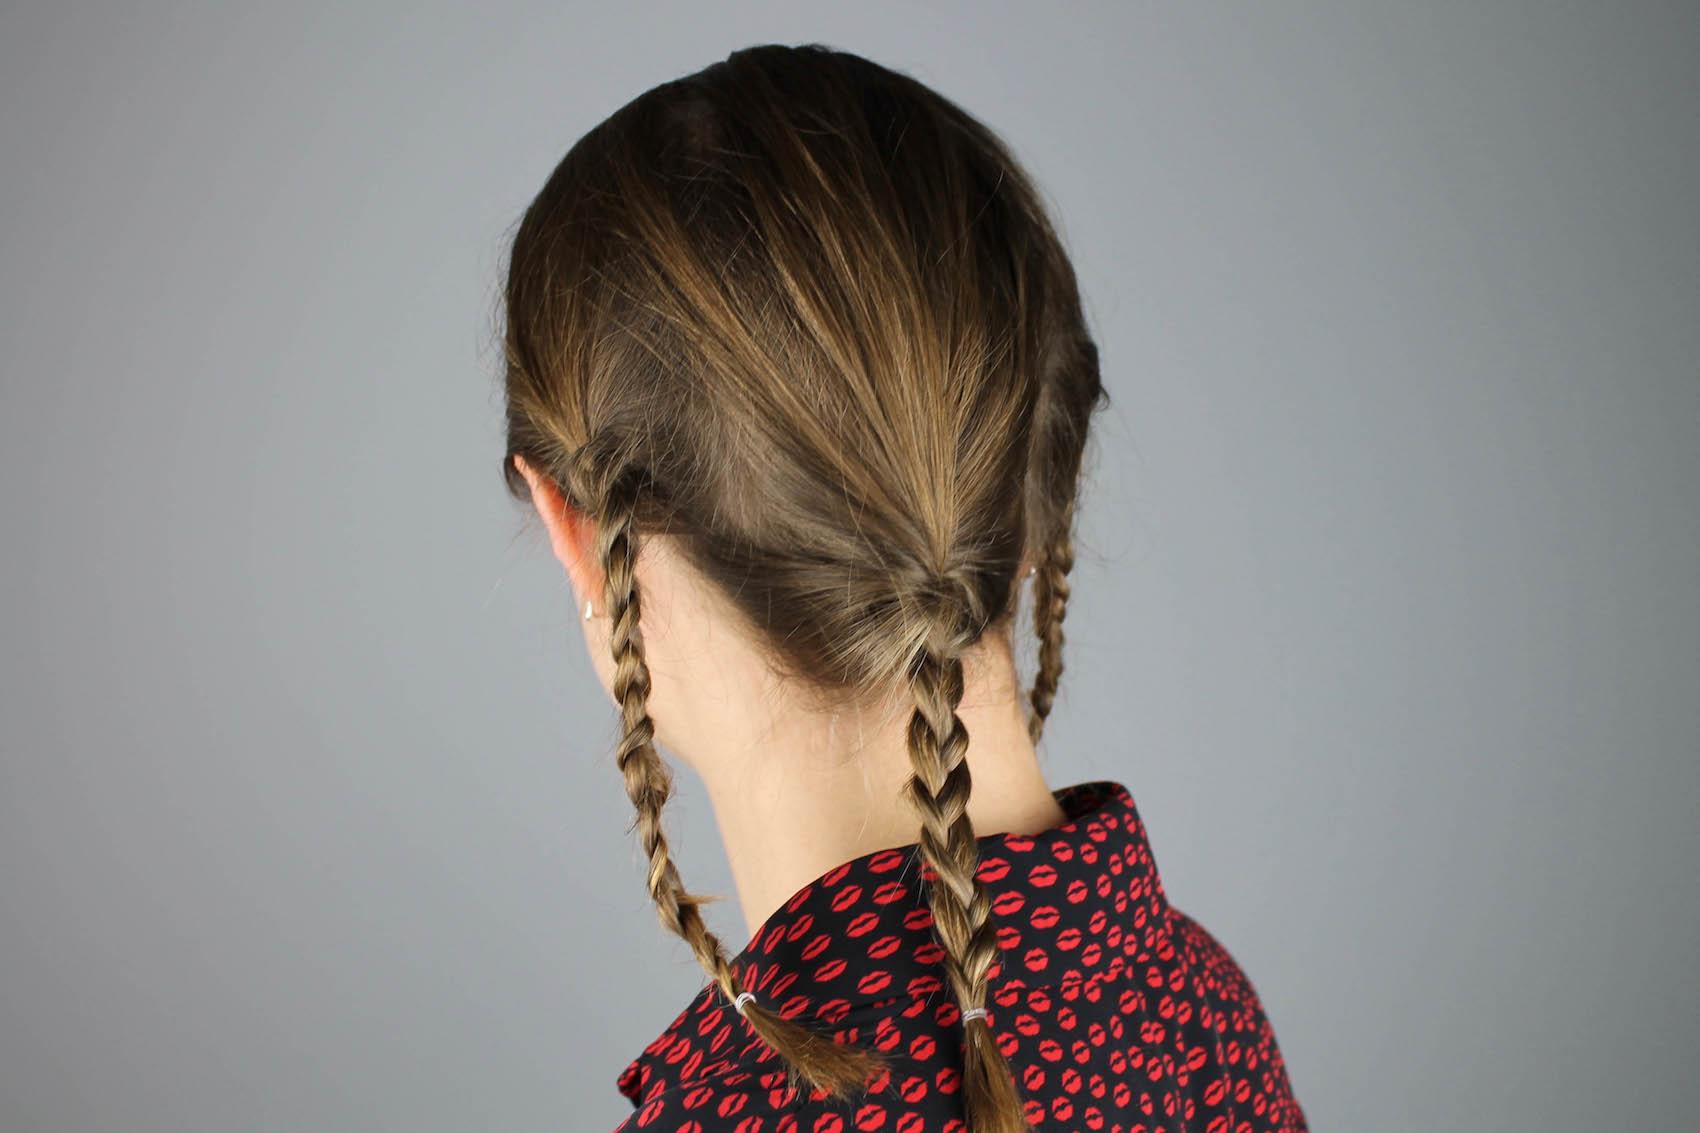 4_1_Suelovesnyc_Silvester_frisuren_styles_newyears_hairstyles_hairstyling_taft_schwarzkopf_susan_fengler_aufmacher_flechtfrisur_winter